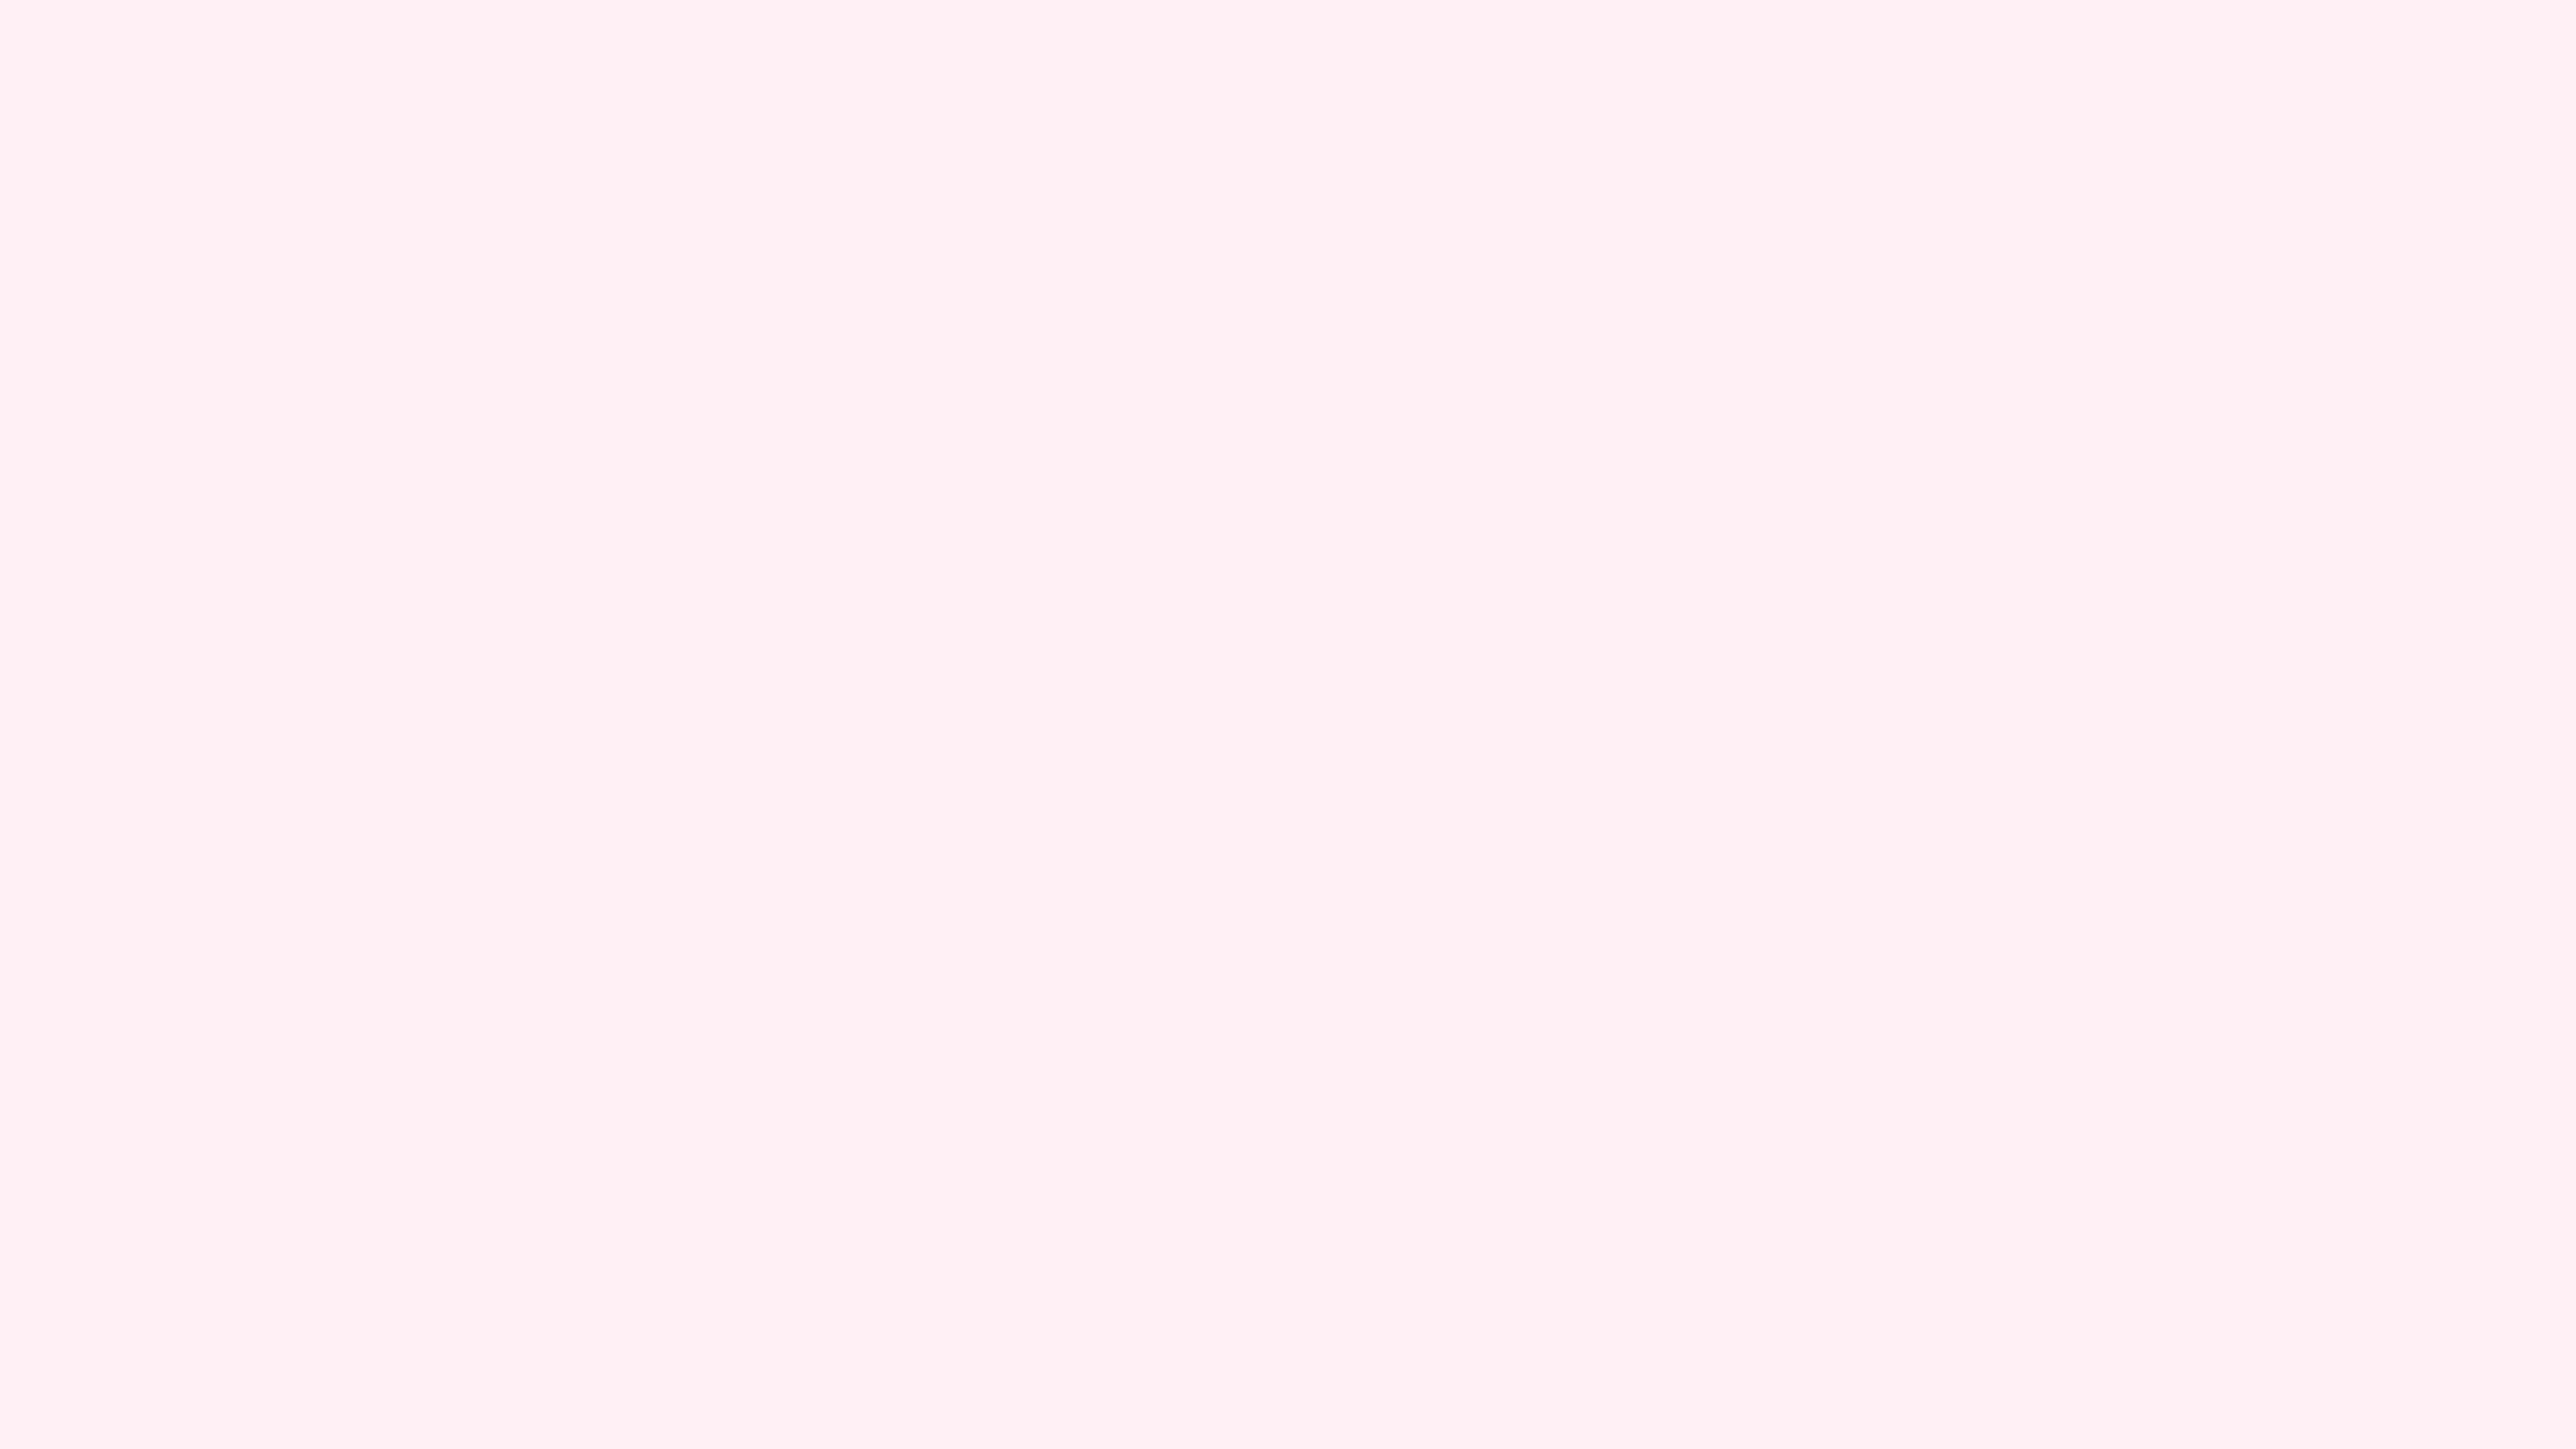 3840x2160 Lavender Blush Solid Color Background